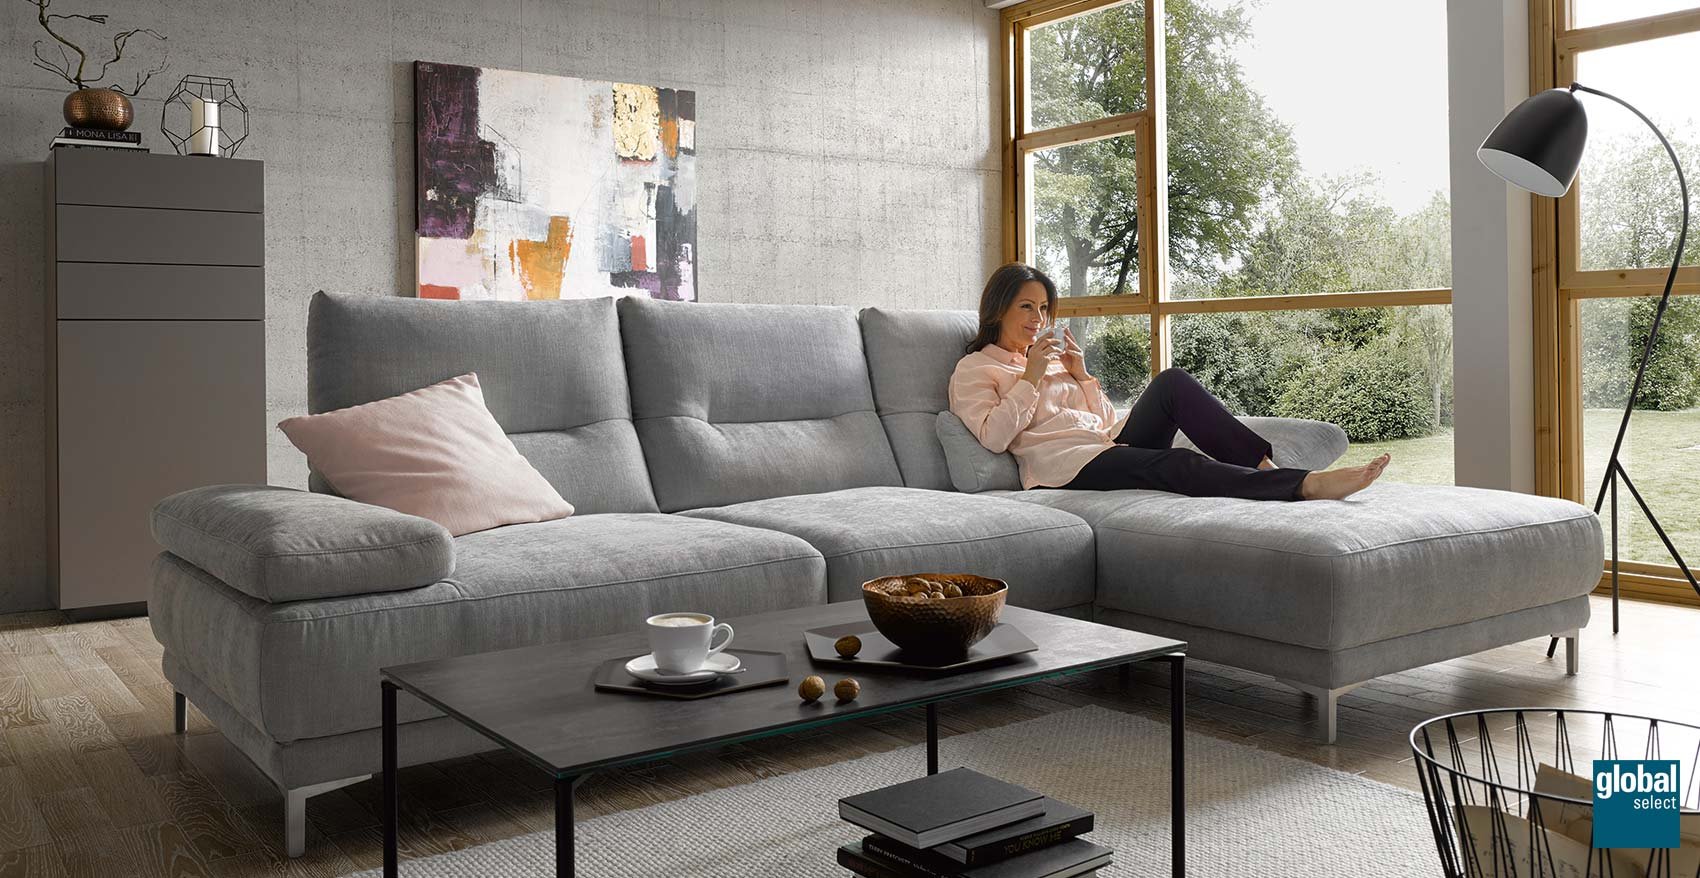 Bemerkenswert Möbelhaus In Der Nähe Foto Von Global Malaga Aus Kollektion Global Select